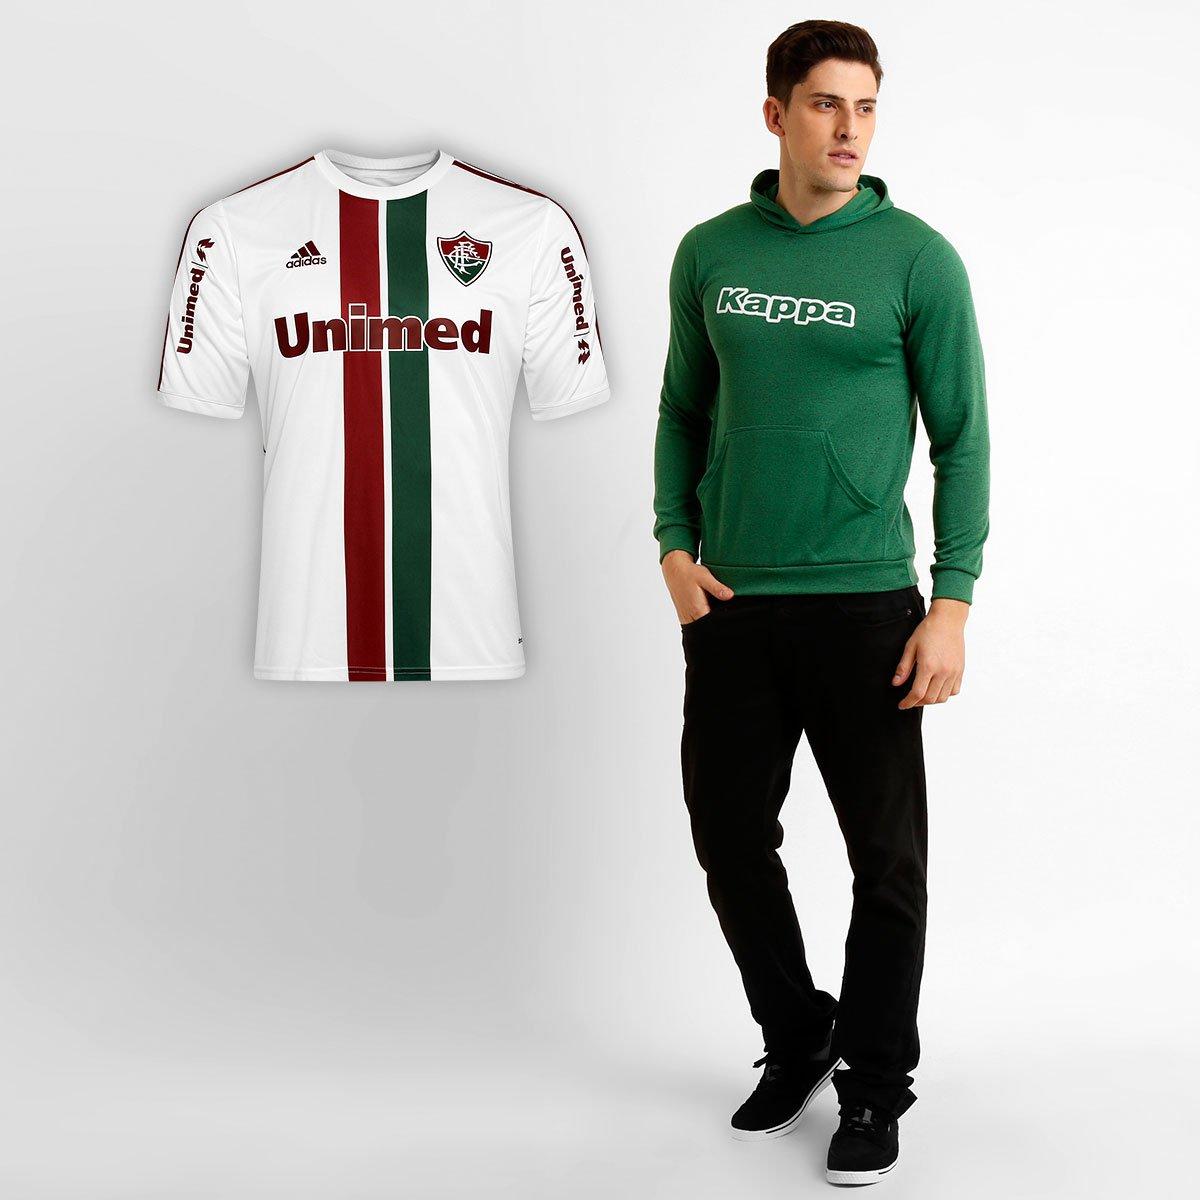 Kit Fluminense - Camisa Adidas Fluminense II 14 15 + Blusão Kappa - Compre  Agora  66c98b9c3e887